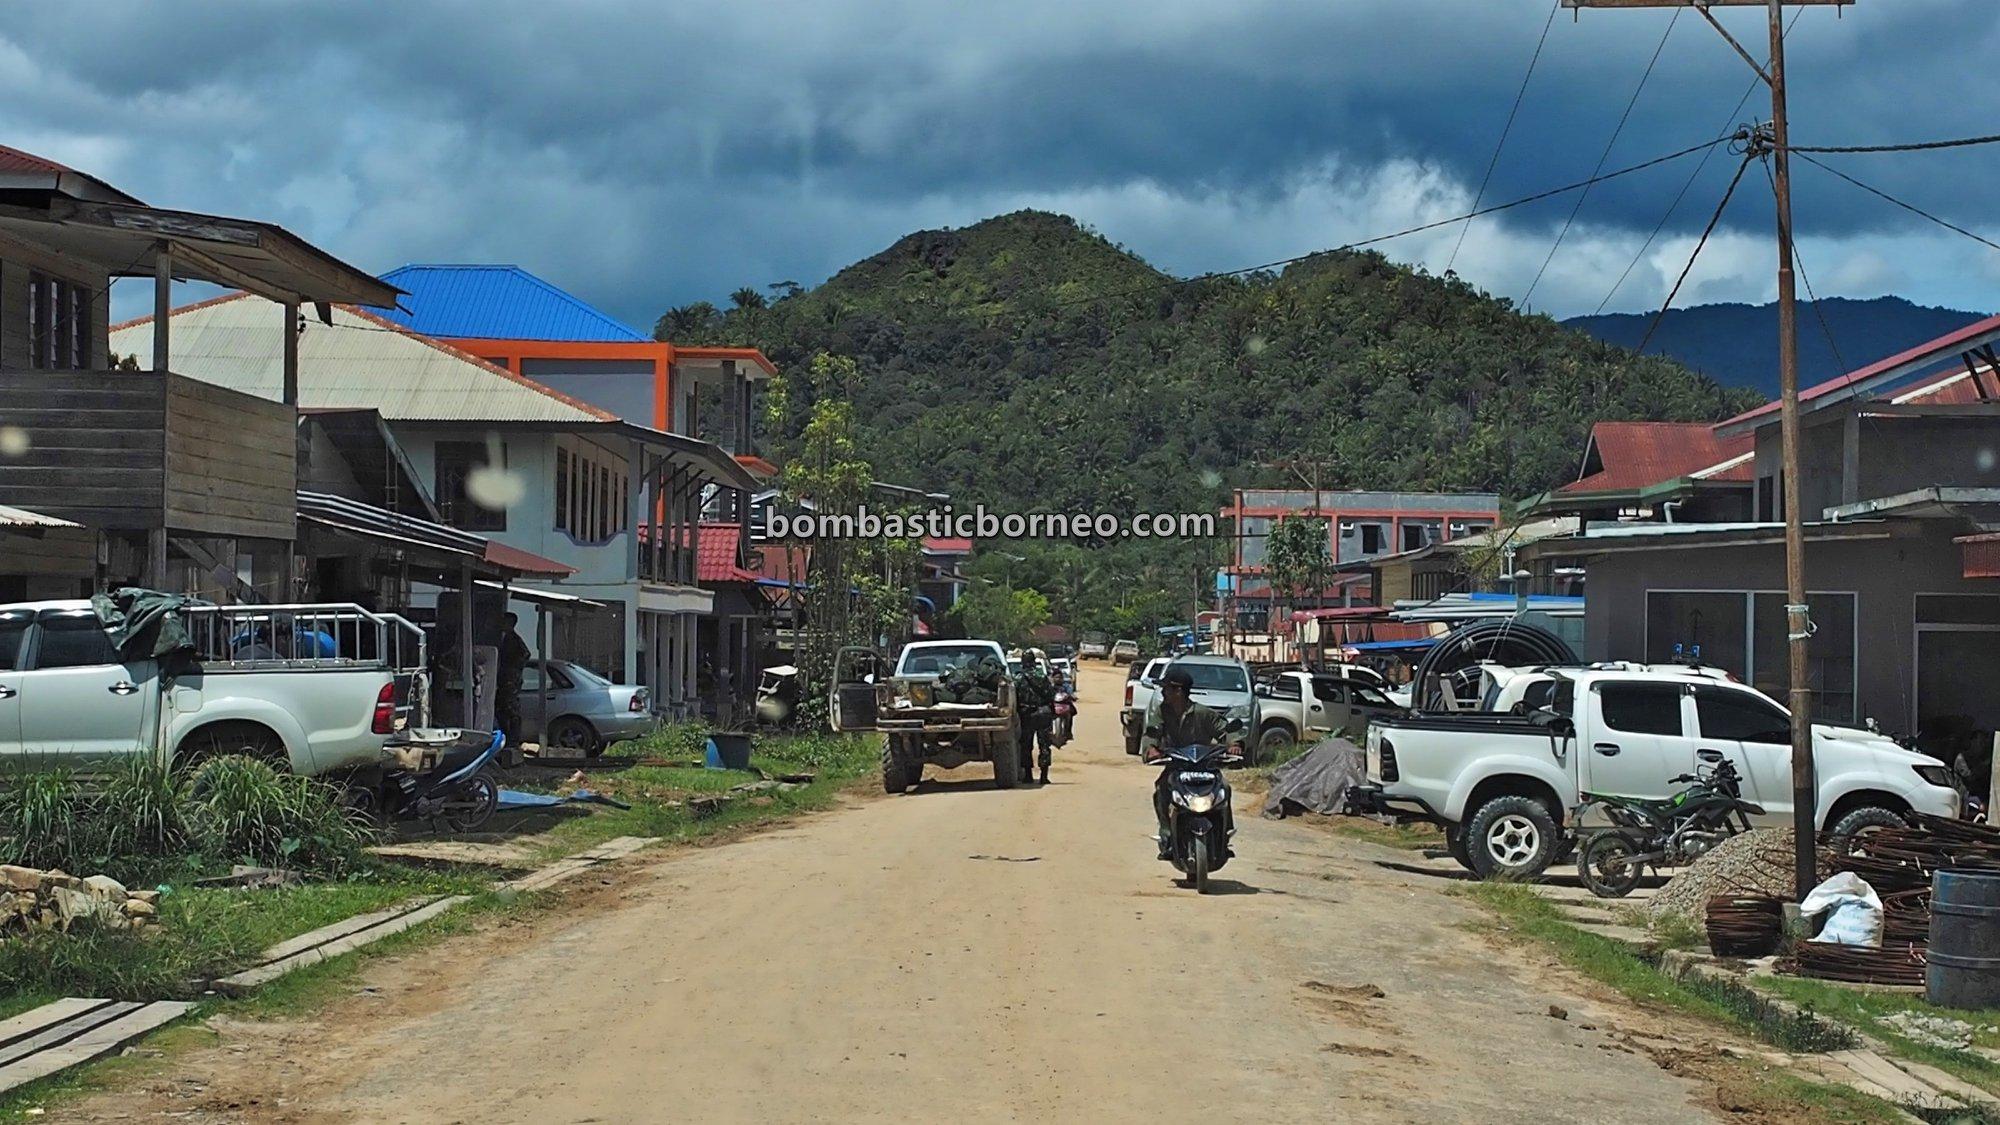 Border town, adventure, traditional, exploration, Interior Village, Highlands, native, Suku Dayak Lundayeh, Obyek wisata, Tourism, travel guide, Cross Border, Borneo, 穿越婆罗洲印尼, 北加里曼丹高原